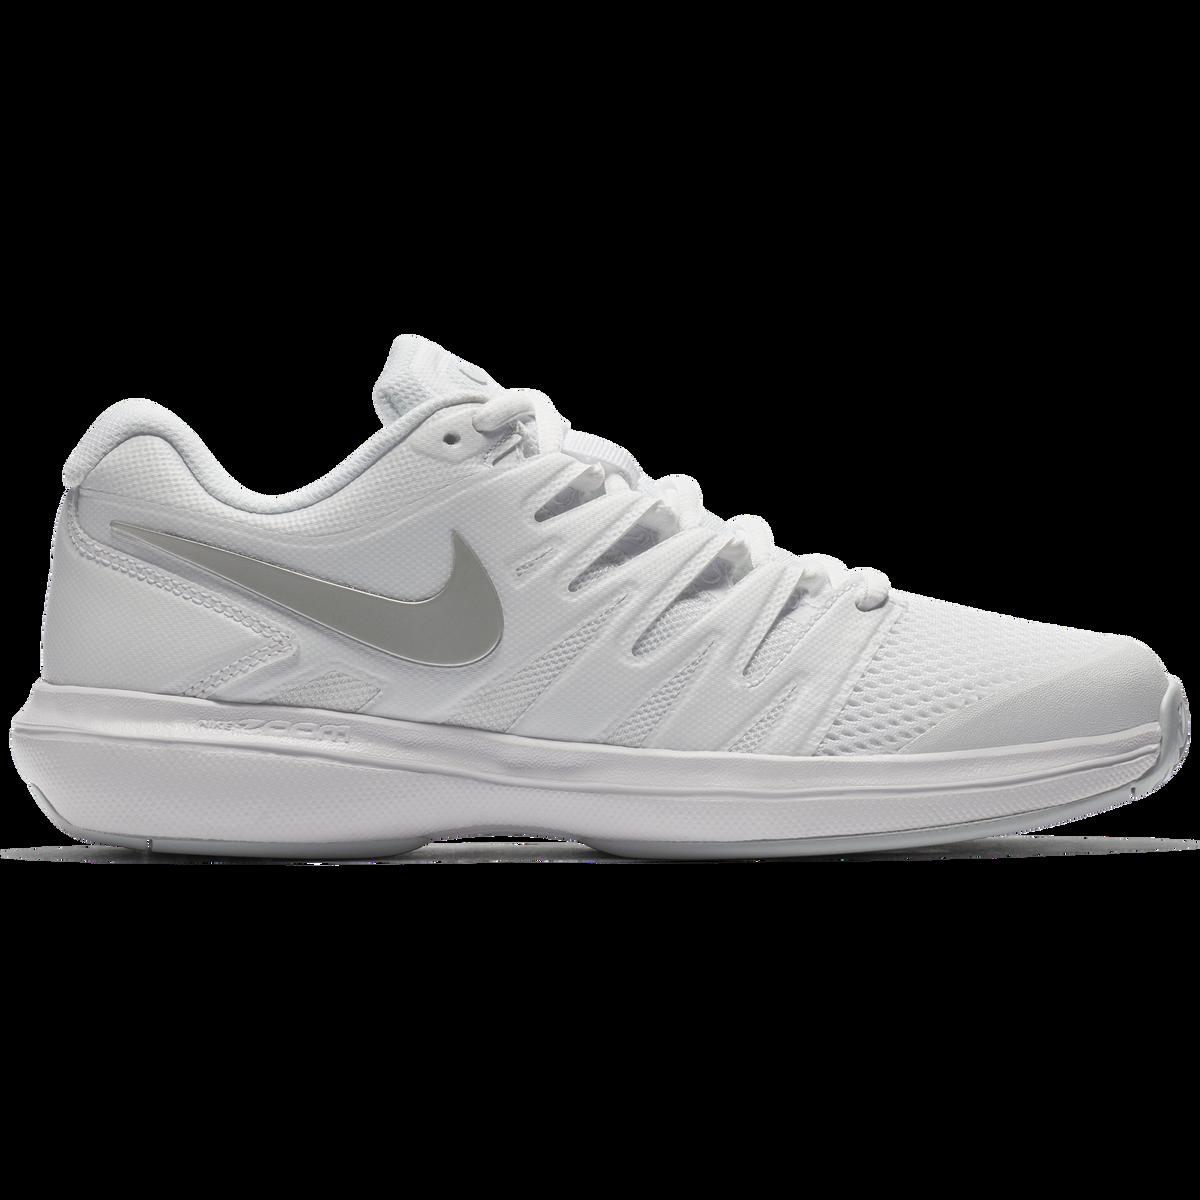 acaaca79471b Nike Air Zoom Prestige Women s Tennis Shoe - White Silver